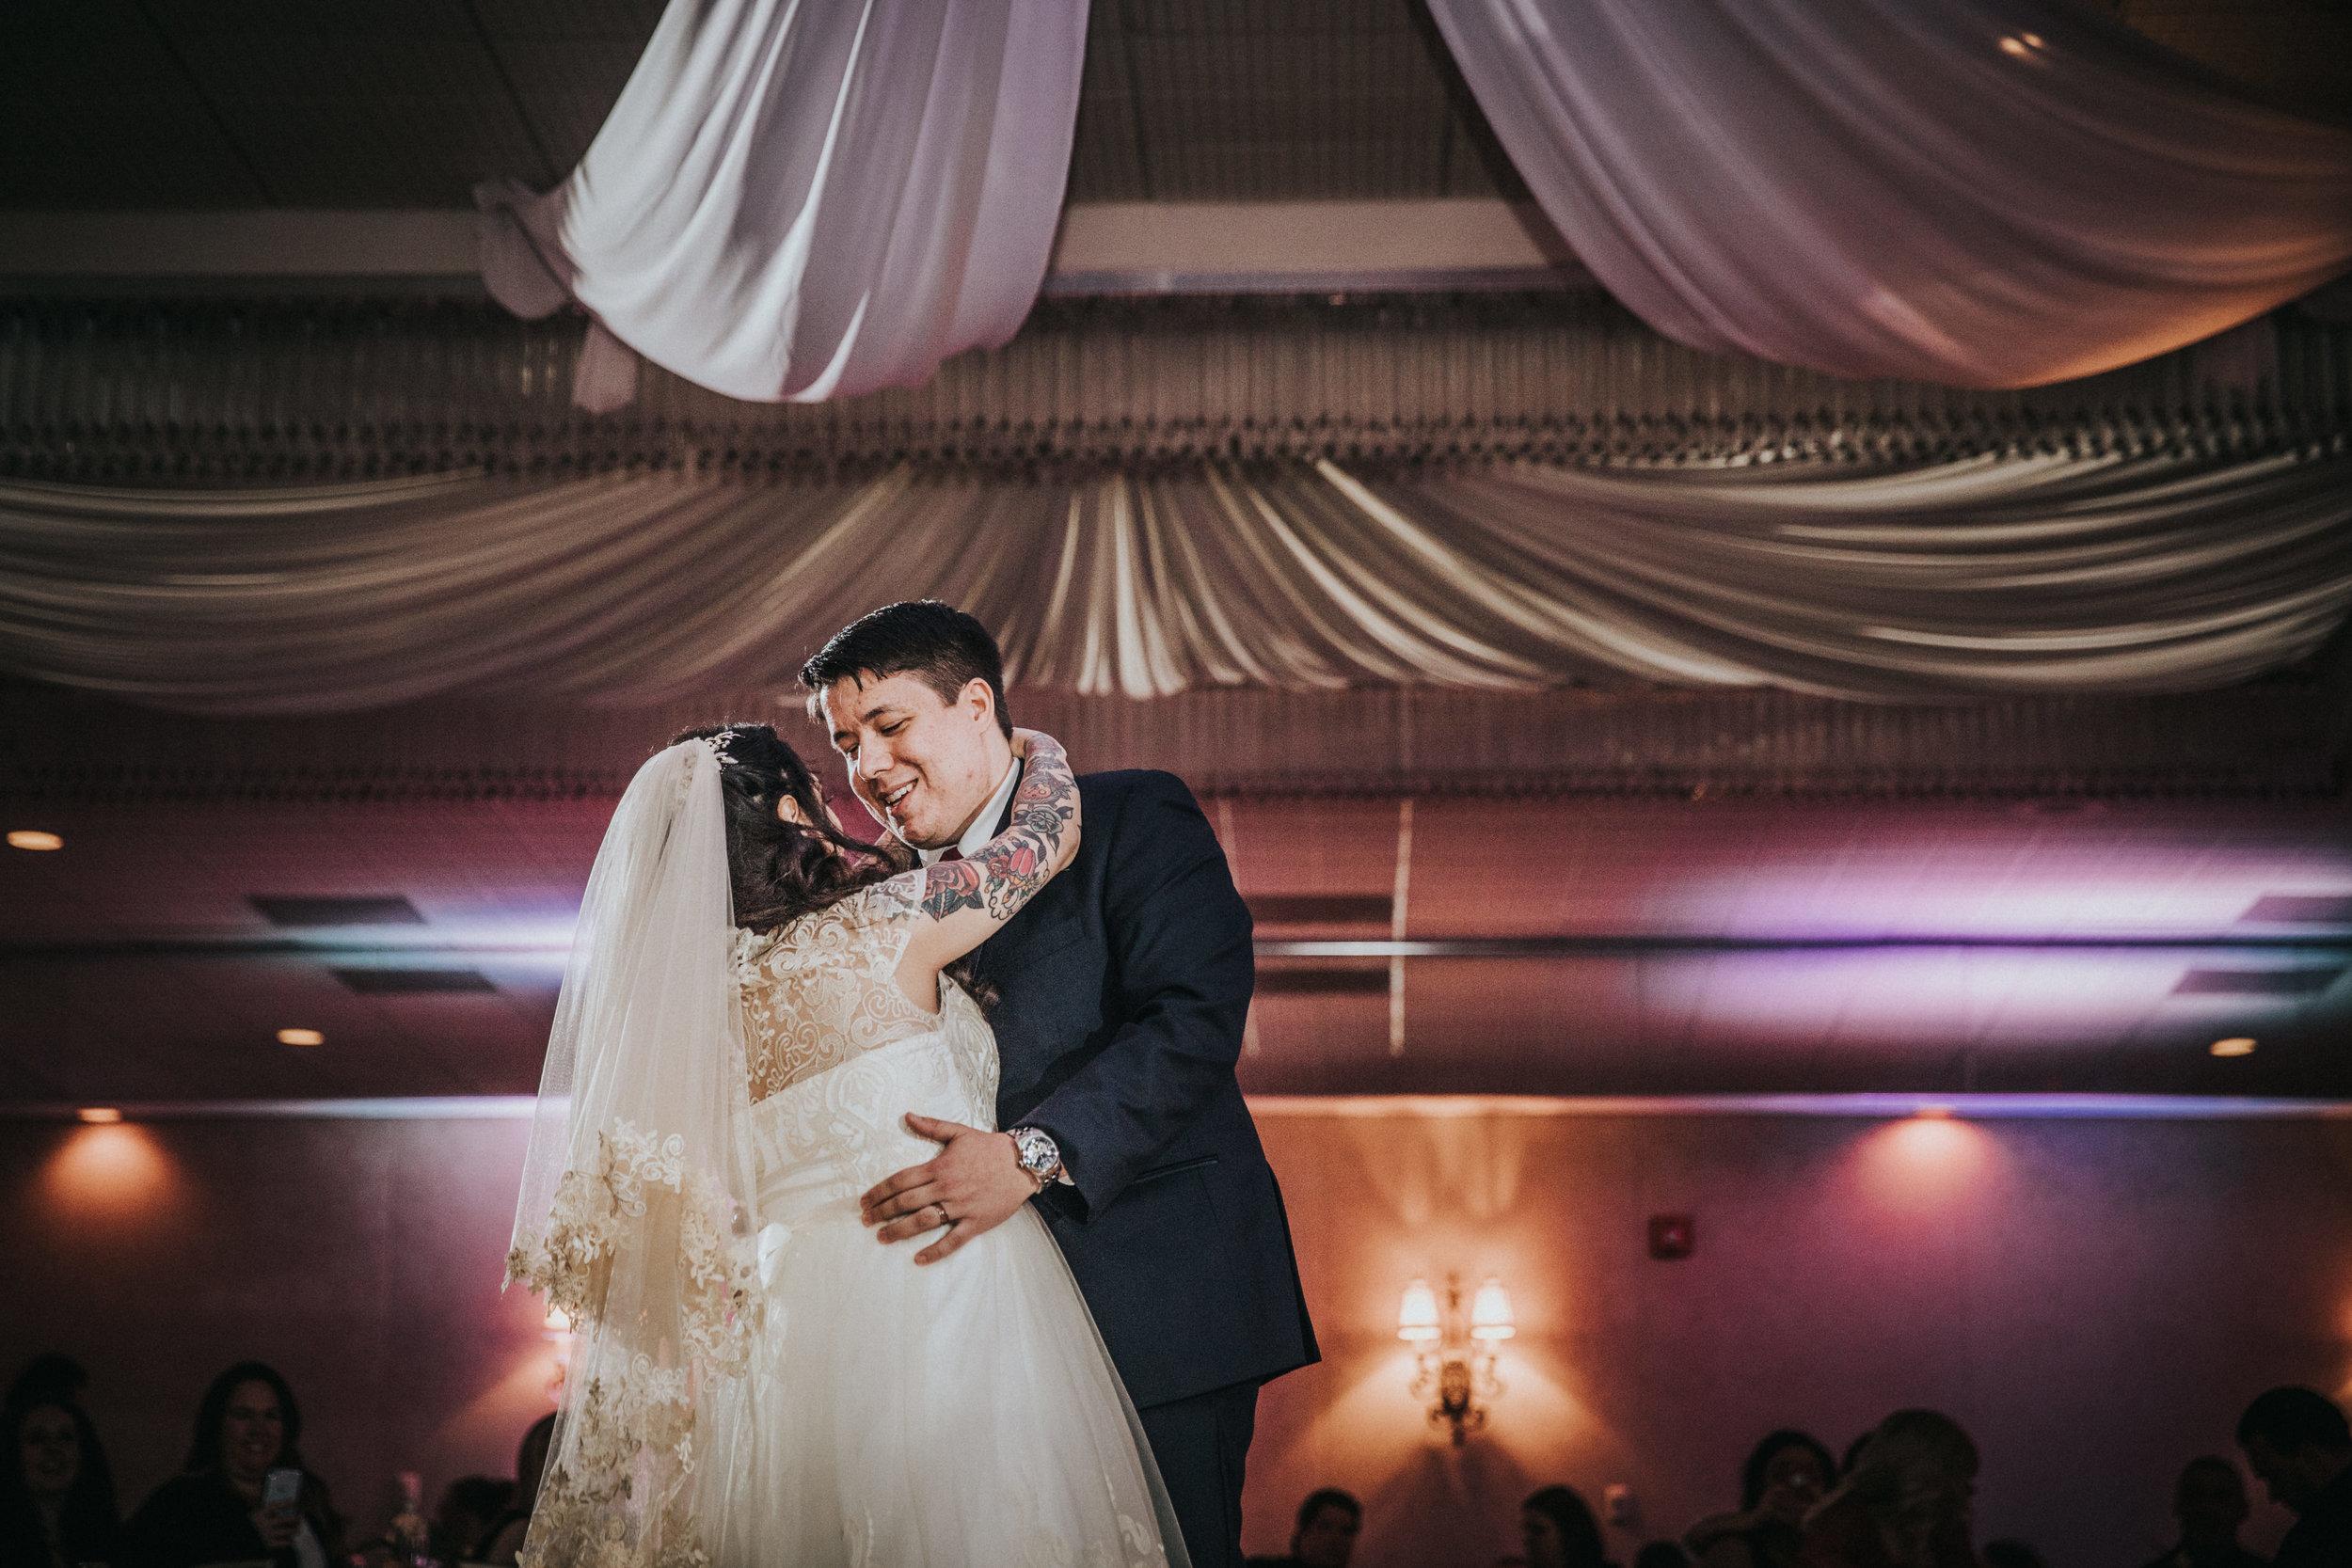 New-Jersey-Wedding-Photographer-ReceptionCenter-Valeria&Mike-Reception (71 of 265).jpg